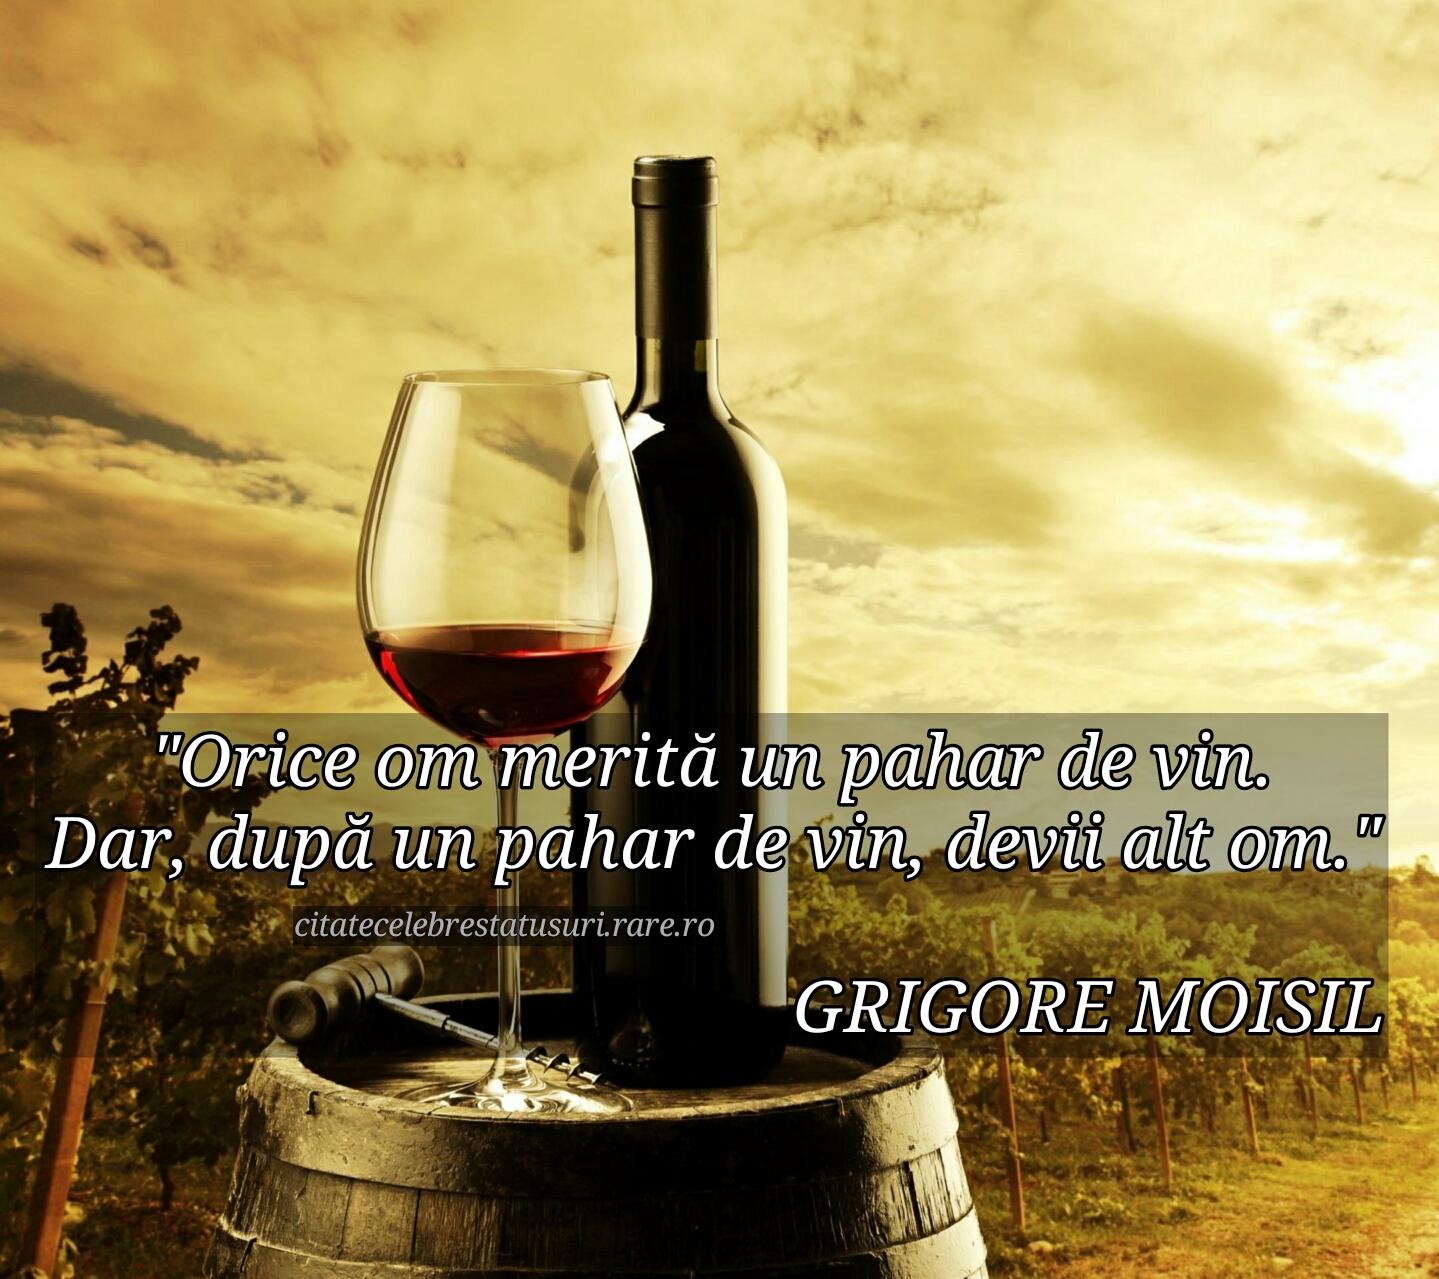 citate celebre despre vin Un pahar de vin   Colectie de citate, statusuri, proverbe, cuvinte  citate celebre despre vin